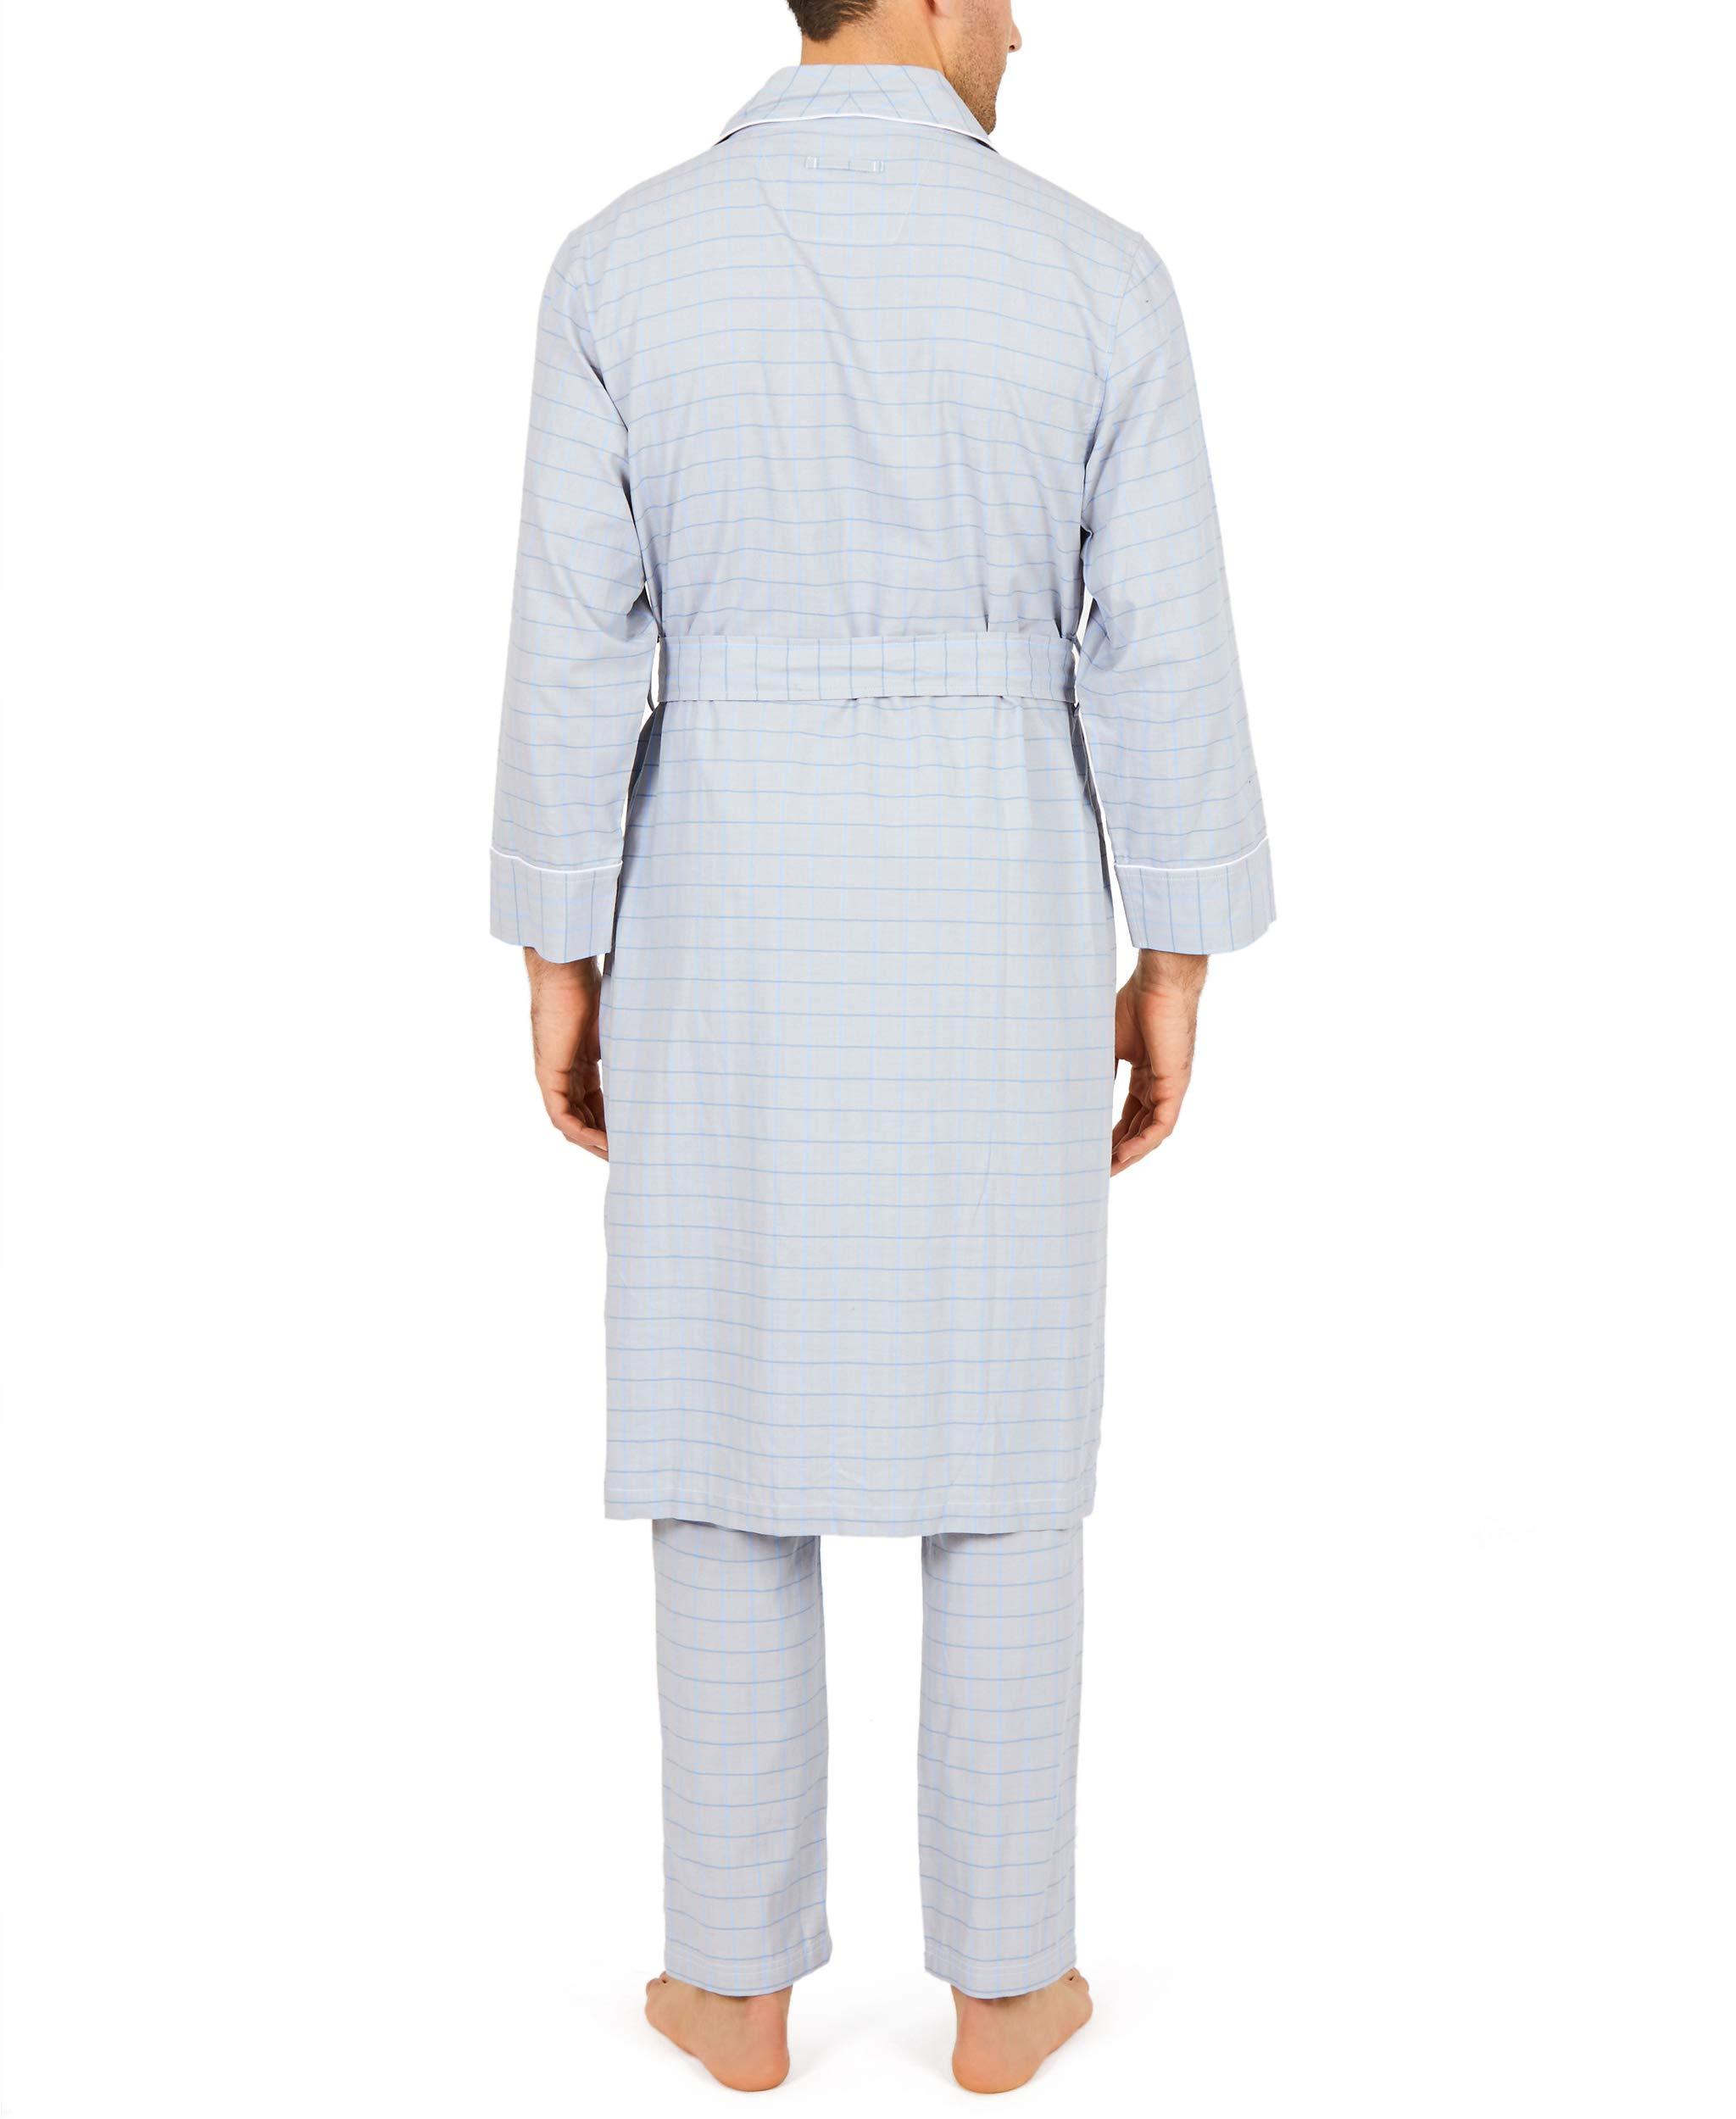 Nautica Mens Sleepwear WR22S7 Herringbone Plaid Cotton Robe Choose SZ//Color.